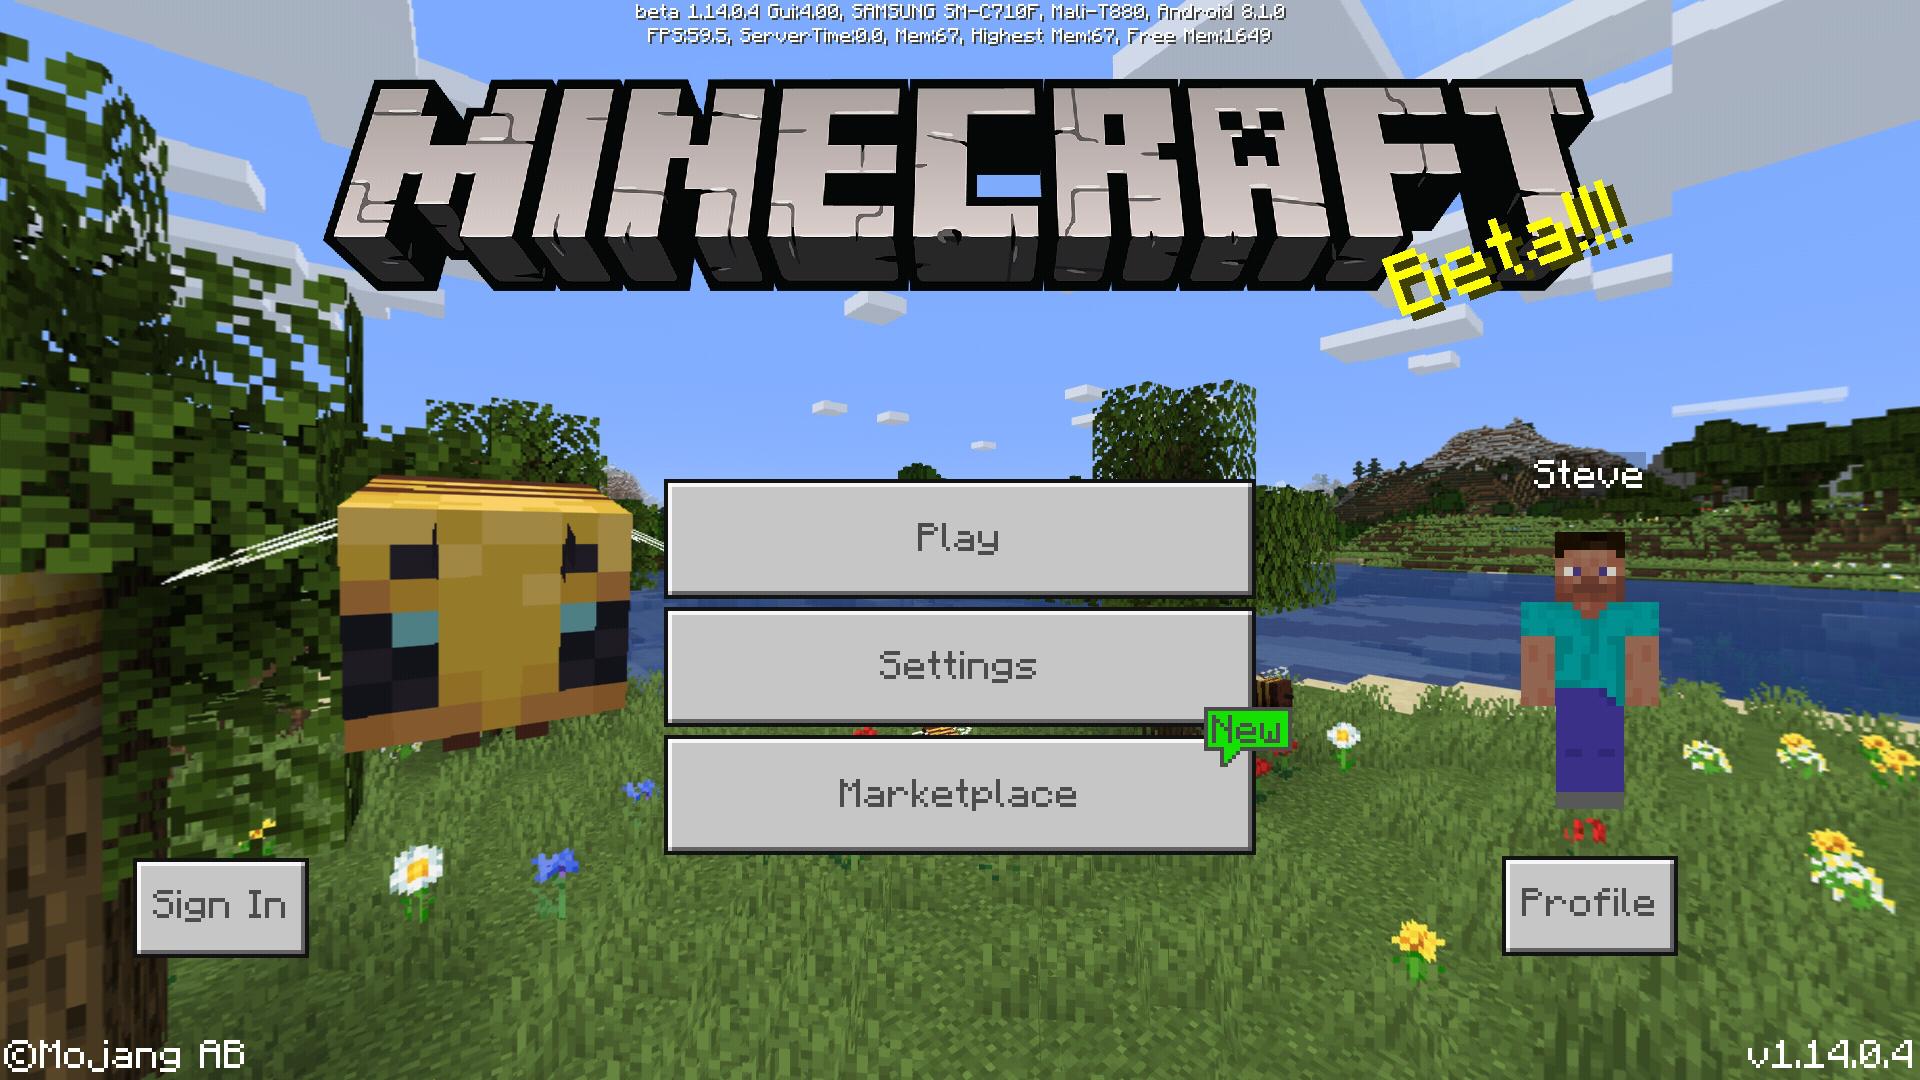 Bedrock Edition beta 1 14 0 4 Official Minecraft Wiki